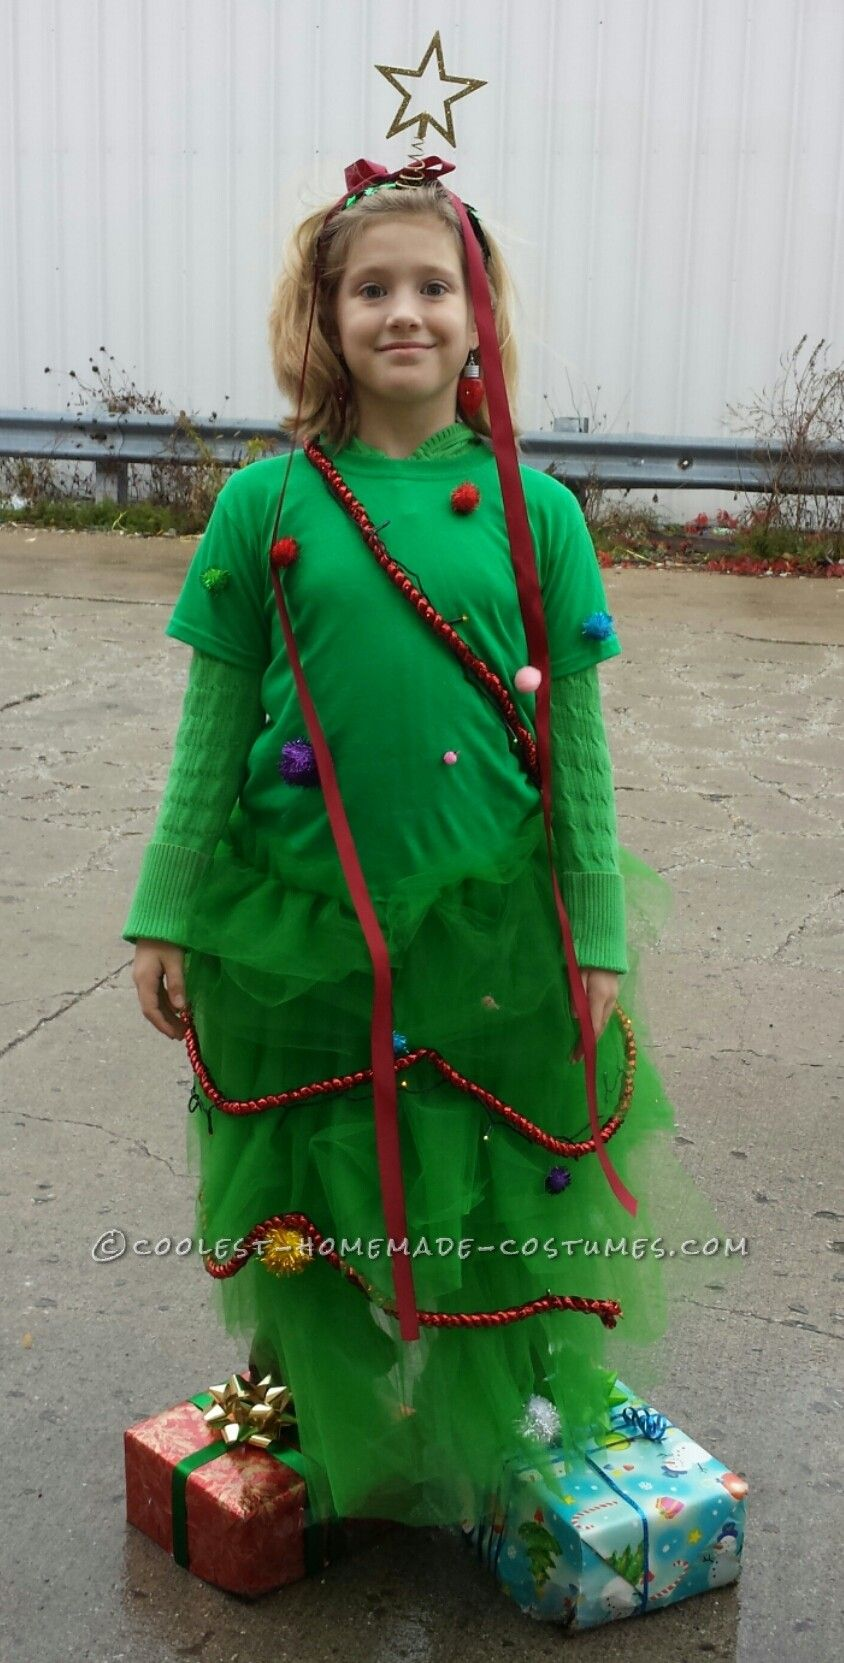 Cool Homemade Christmas Tree Halloween Costume | Homemade ...